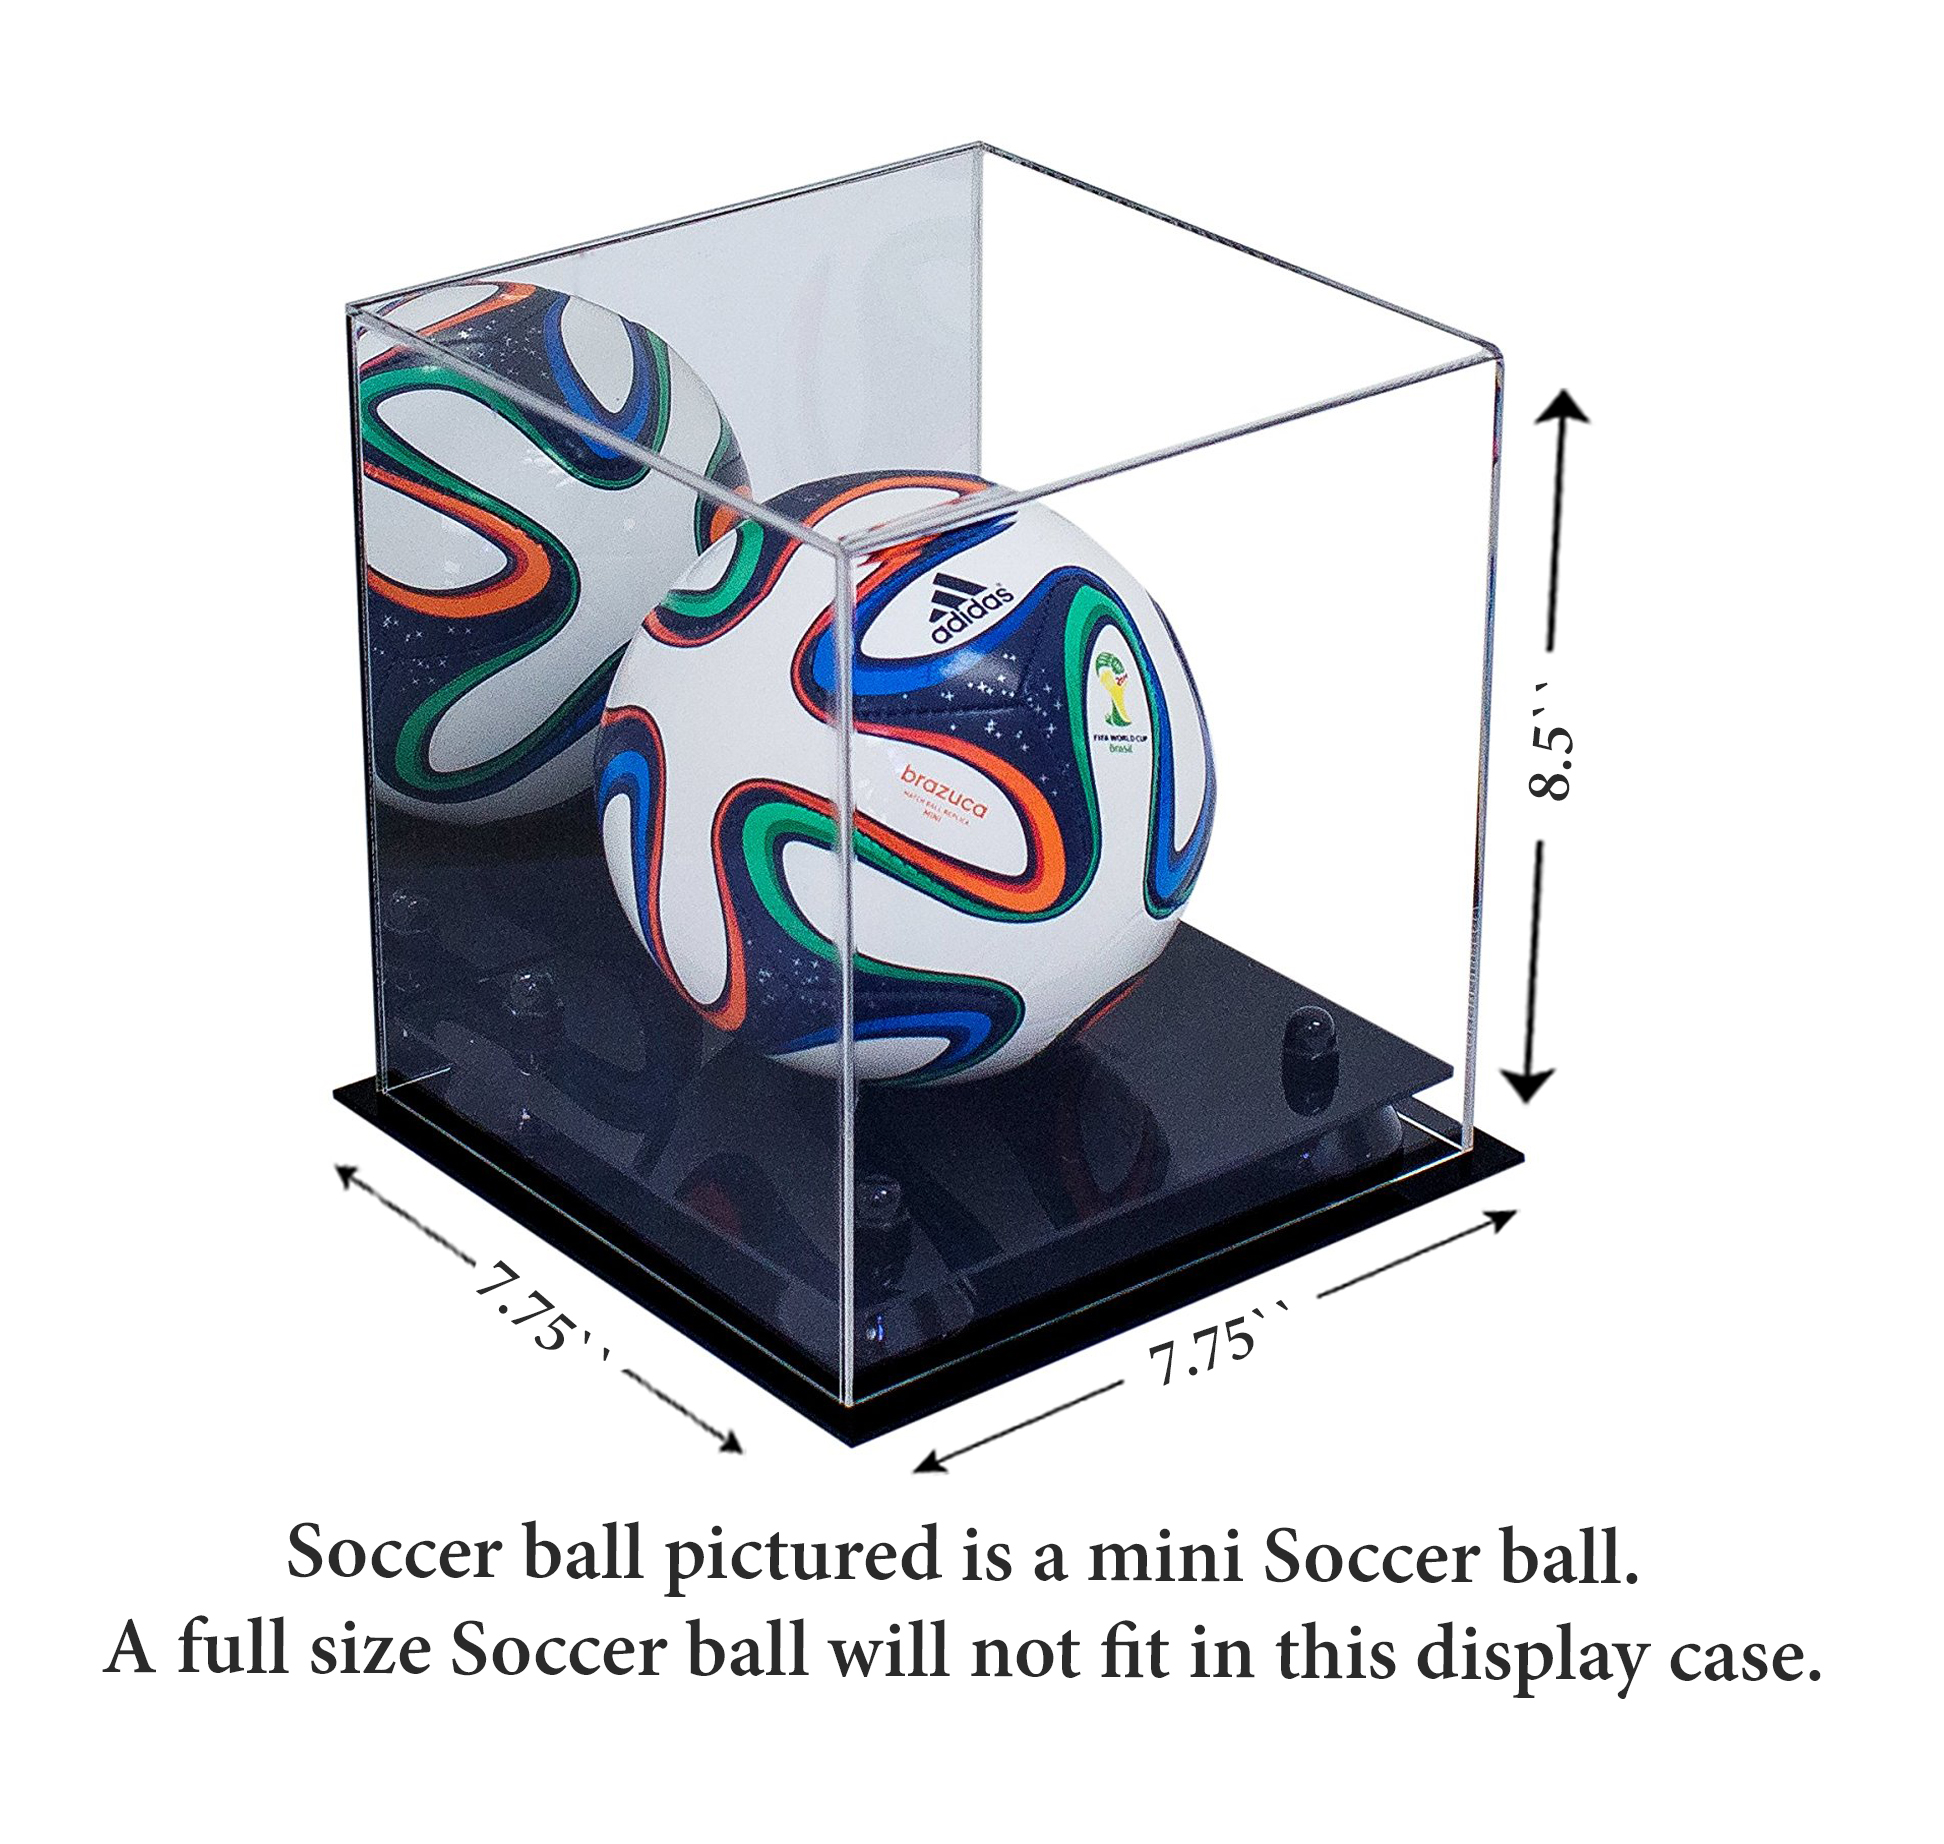 A015-GR Mirror Acrylic MINI Miniature Soccer Ball Display Case-Gold Risers